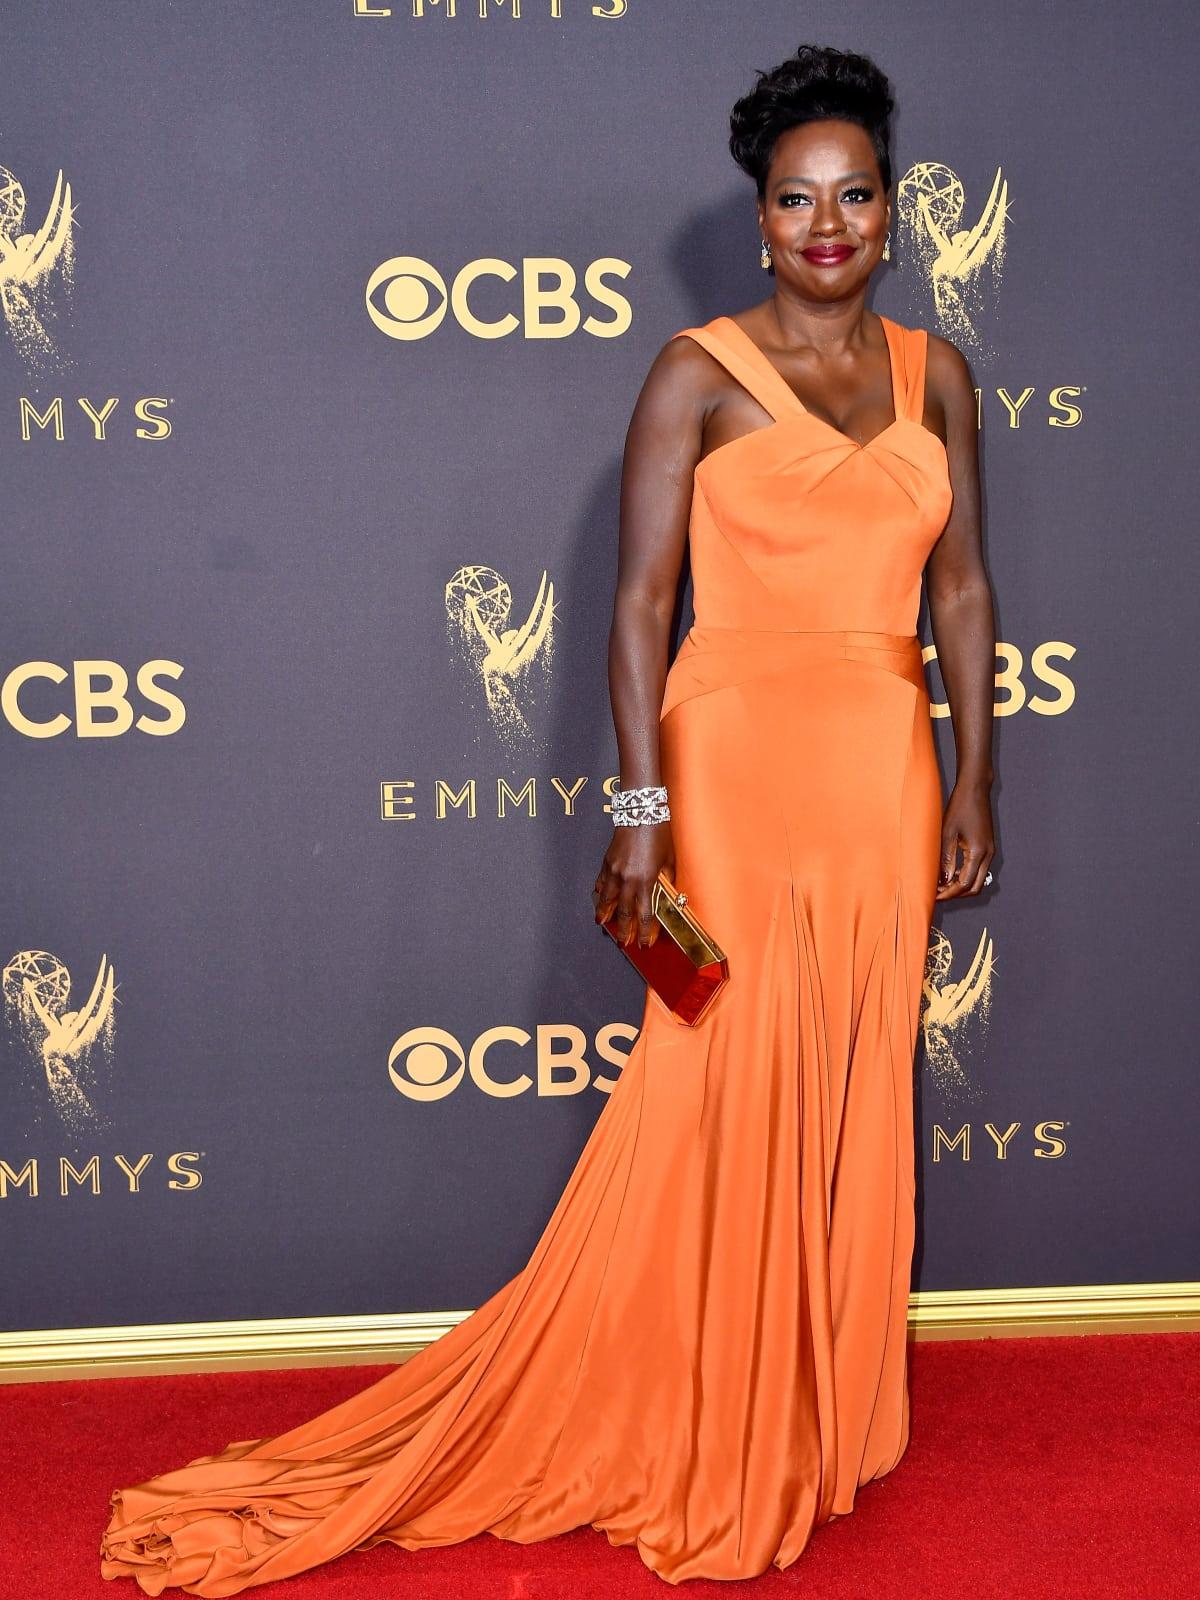 Viola Davis in Zac Posen at Emmy Awards 2017